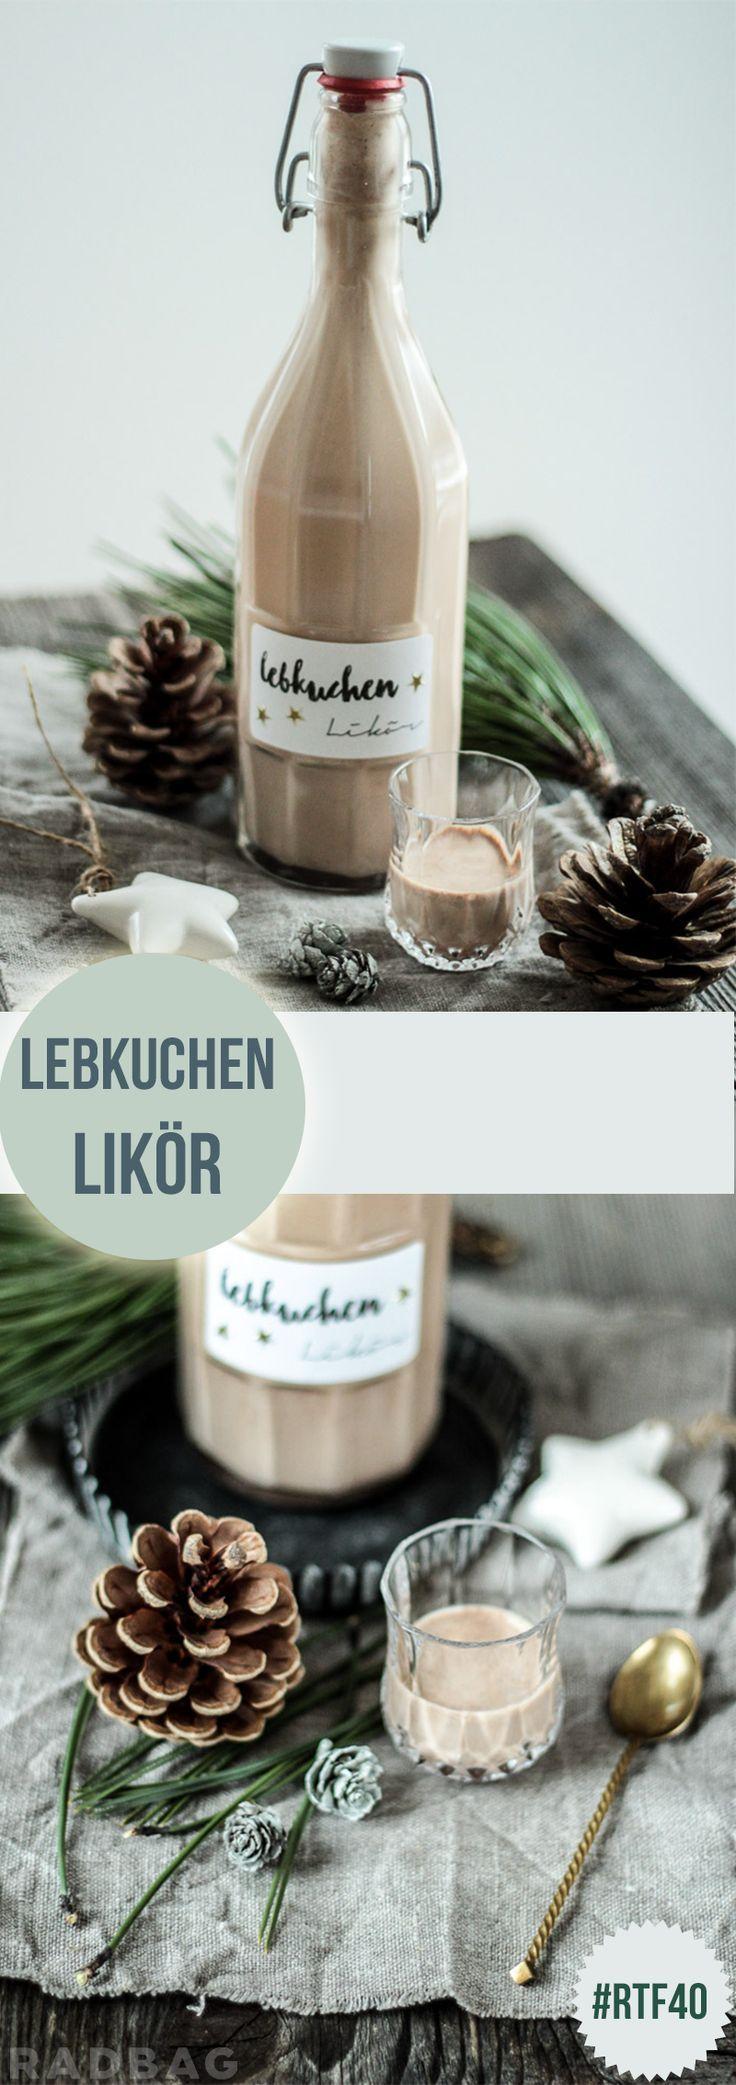 Liqueur of gingerbread. #weihnachtsgeschenke #likör #lebkuchen